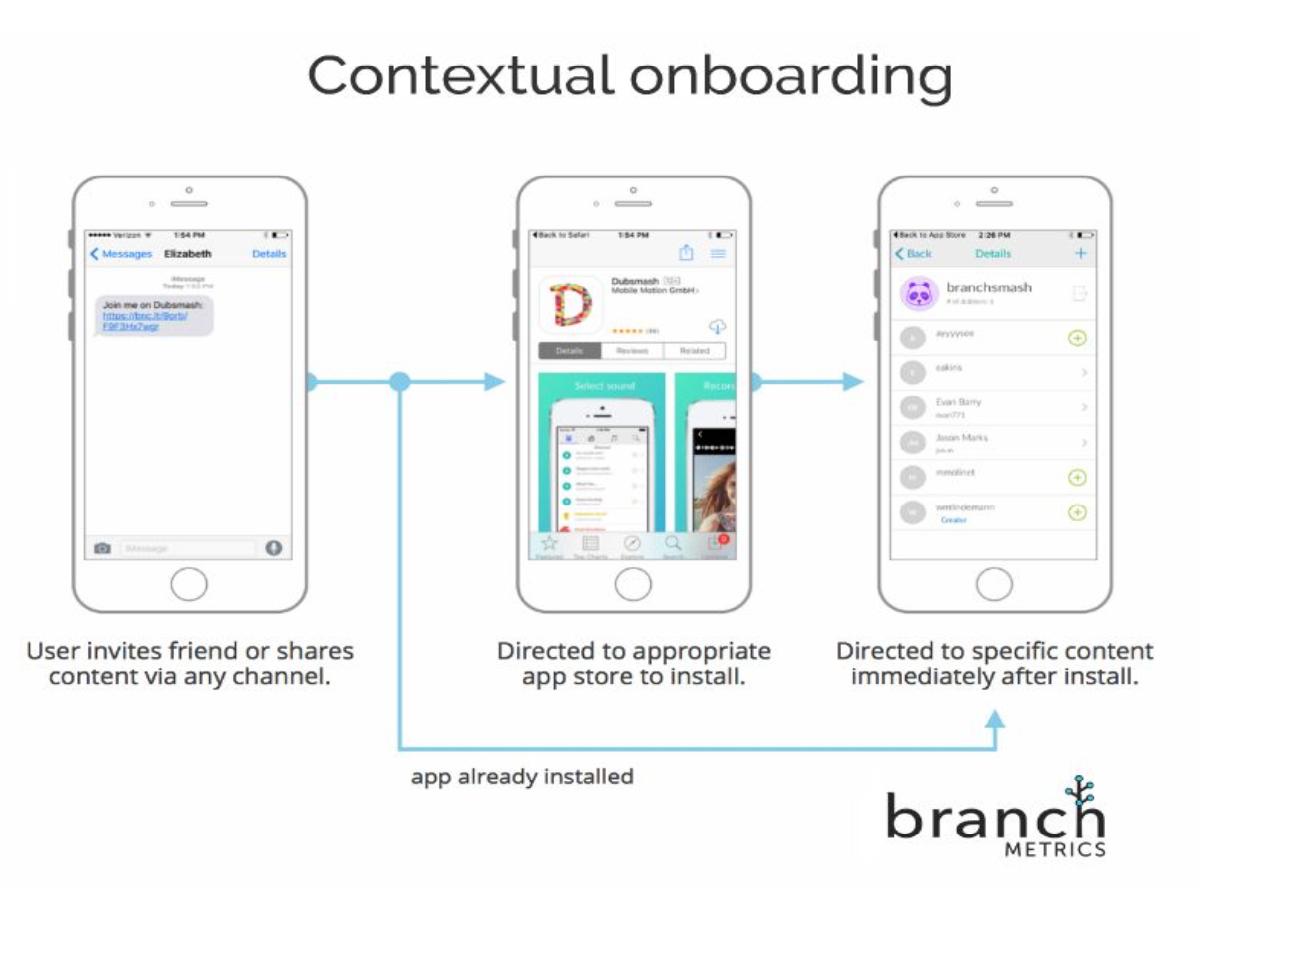 mobile marketing contextual onboarding